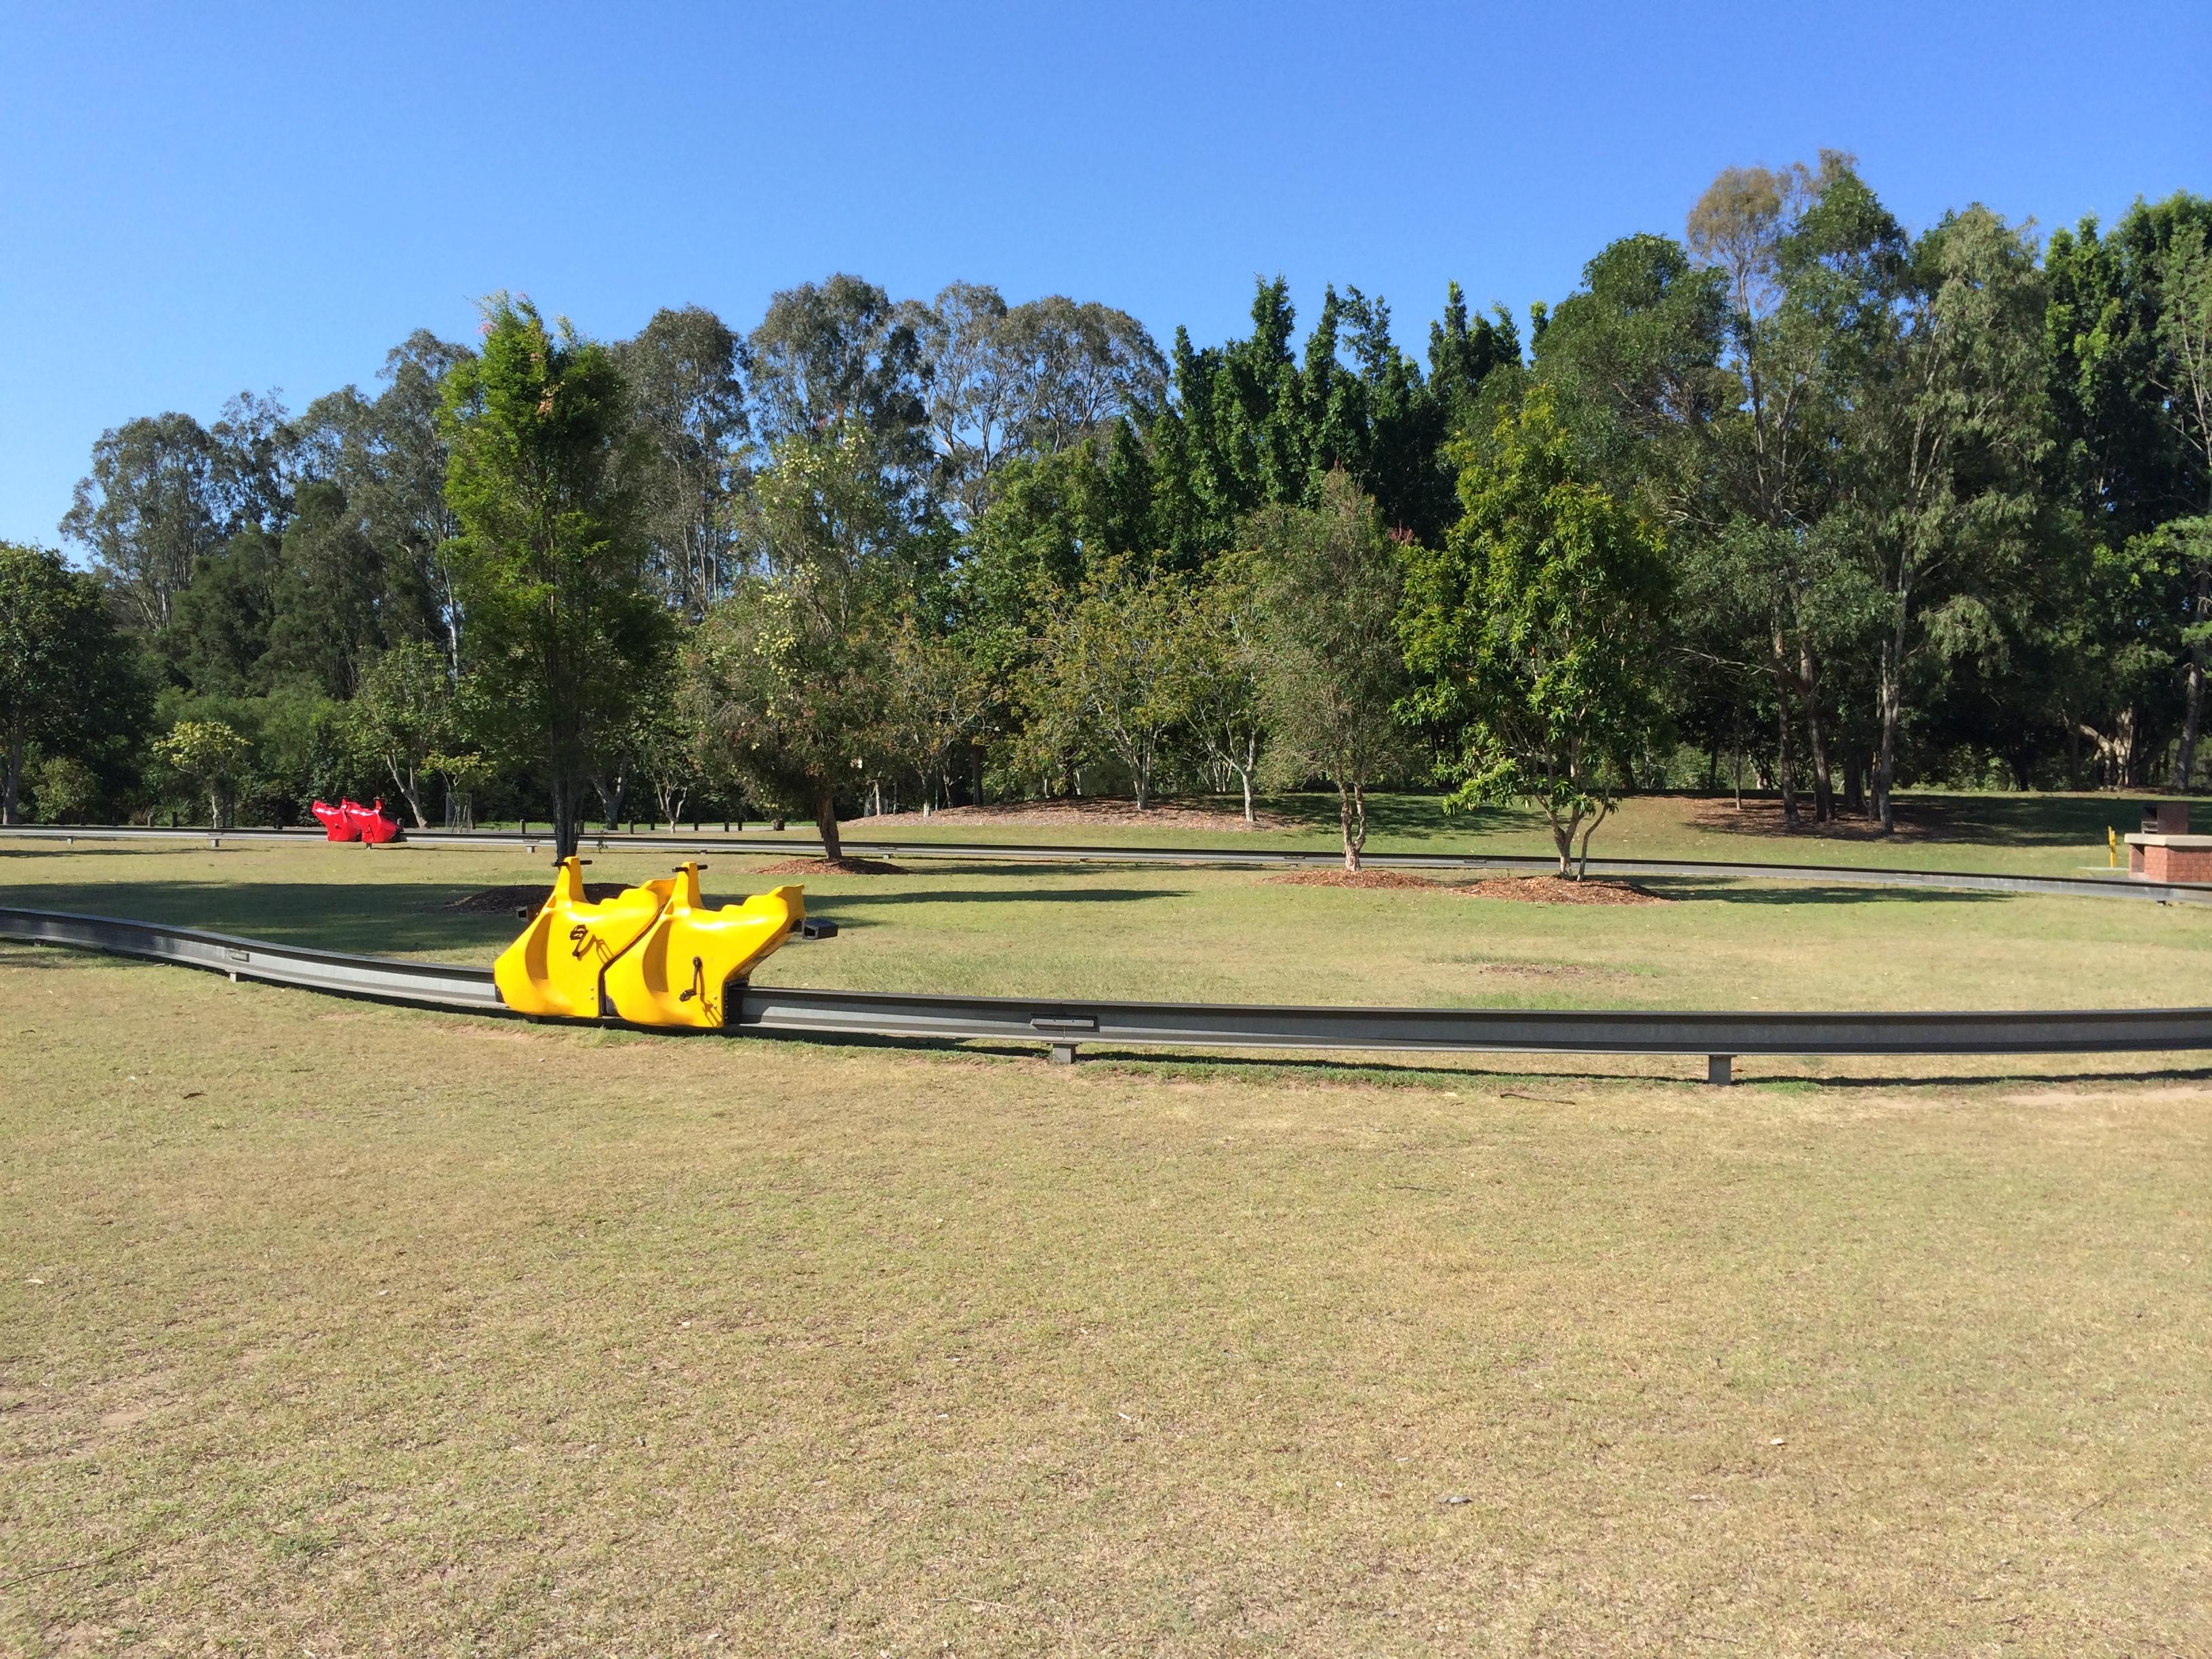 Our day enjoying the green lawns at Alexander Clark Park, Loganholme © GreenSocks